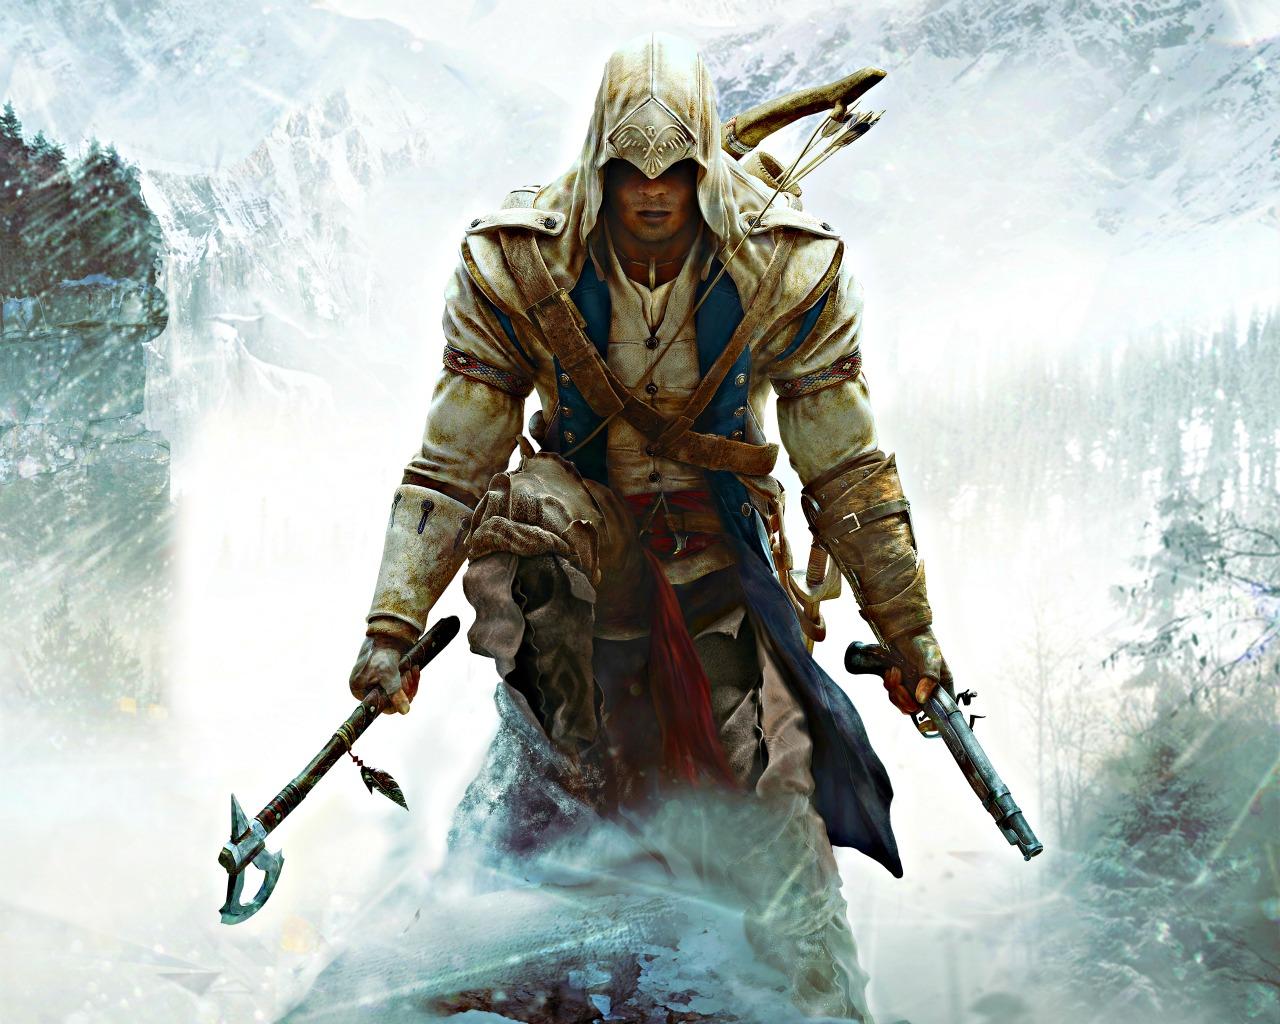 assassins creed 3 wallpaper 1280x1024 1280x1024